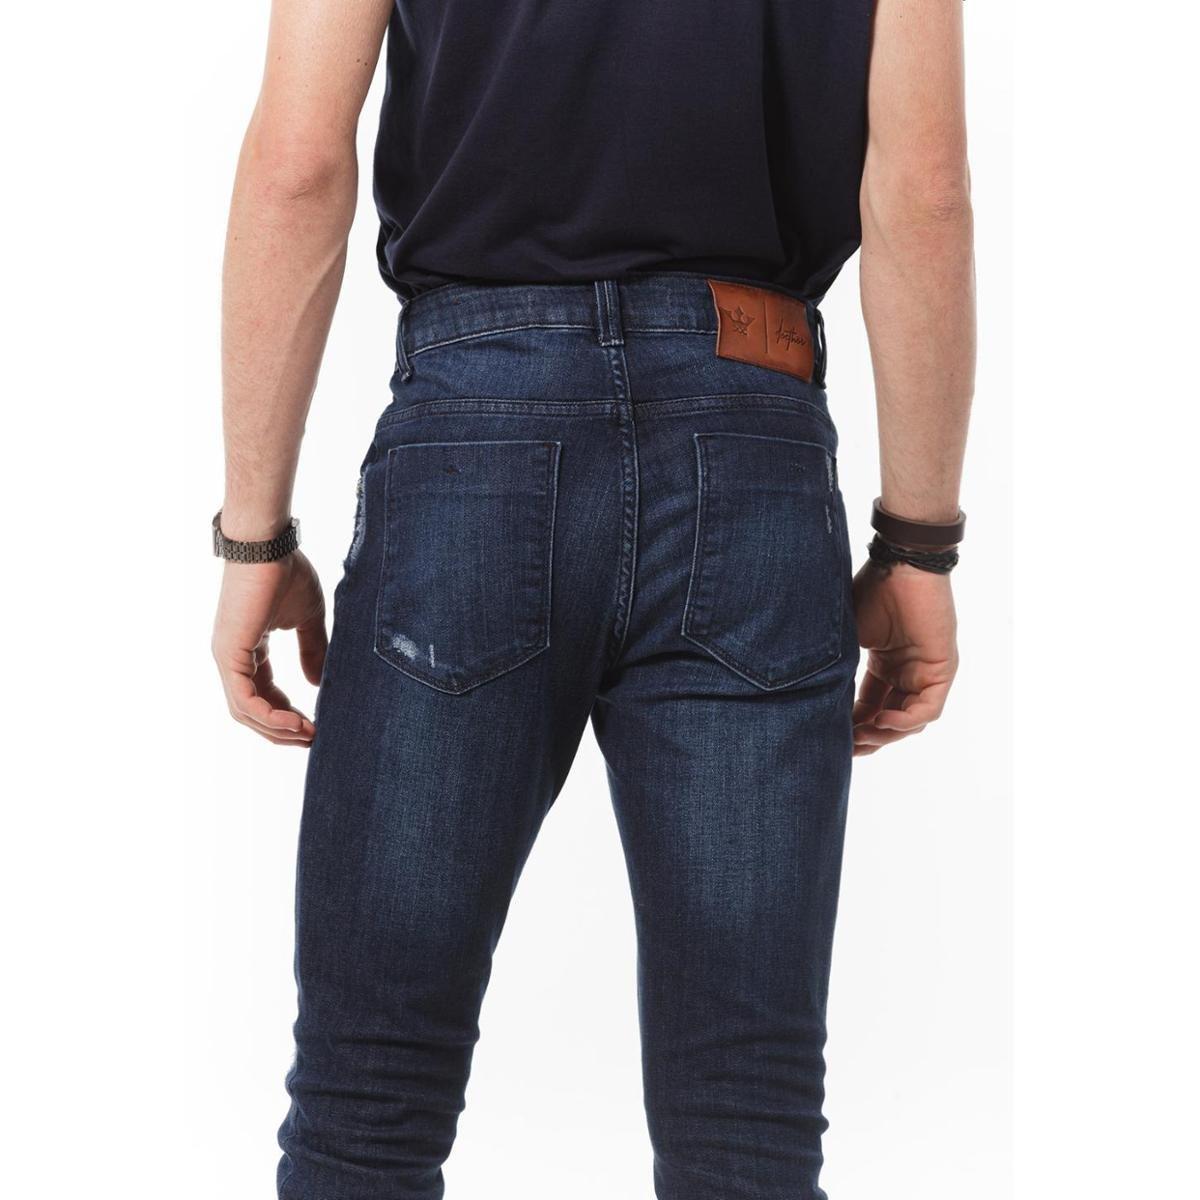 Calça Docthos Jeans Masculino - Azul